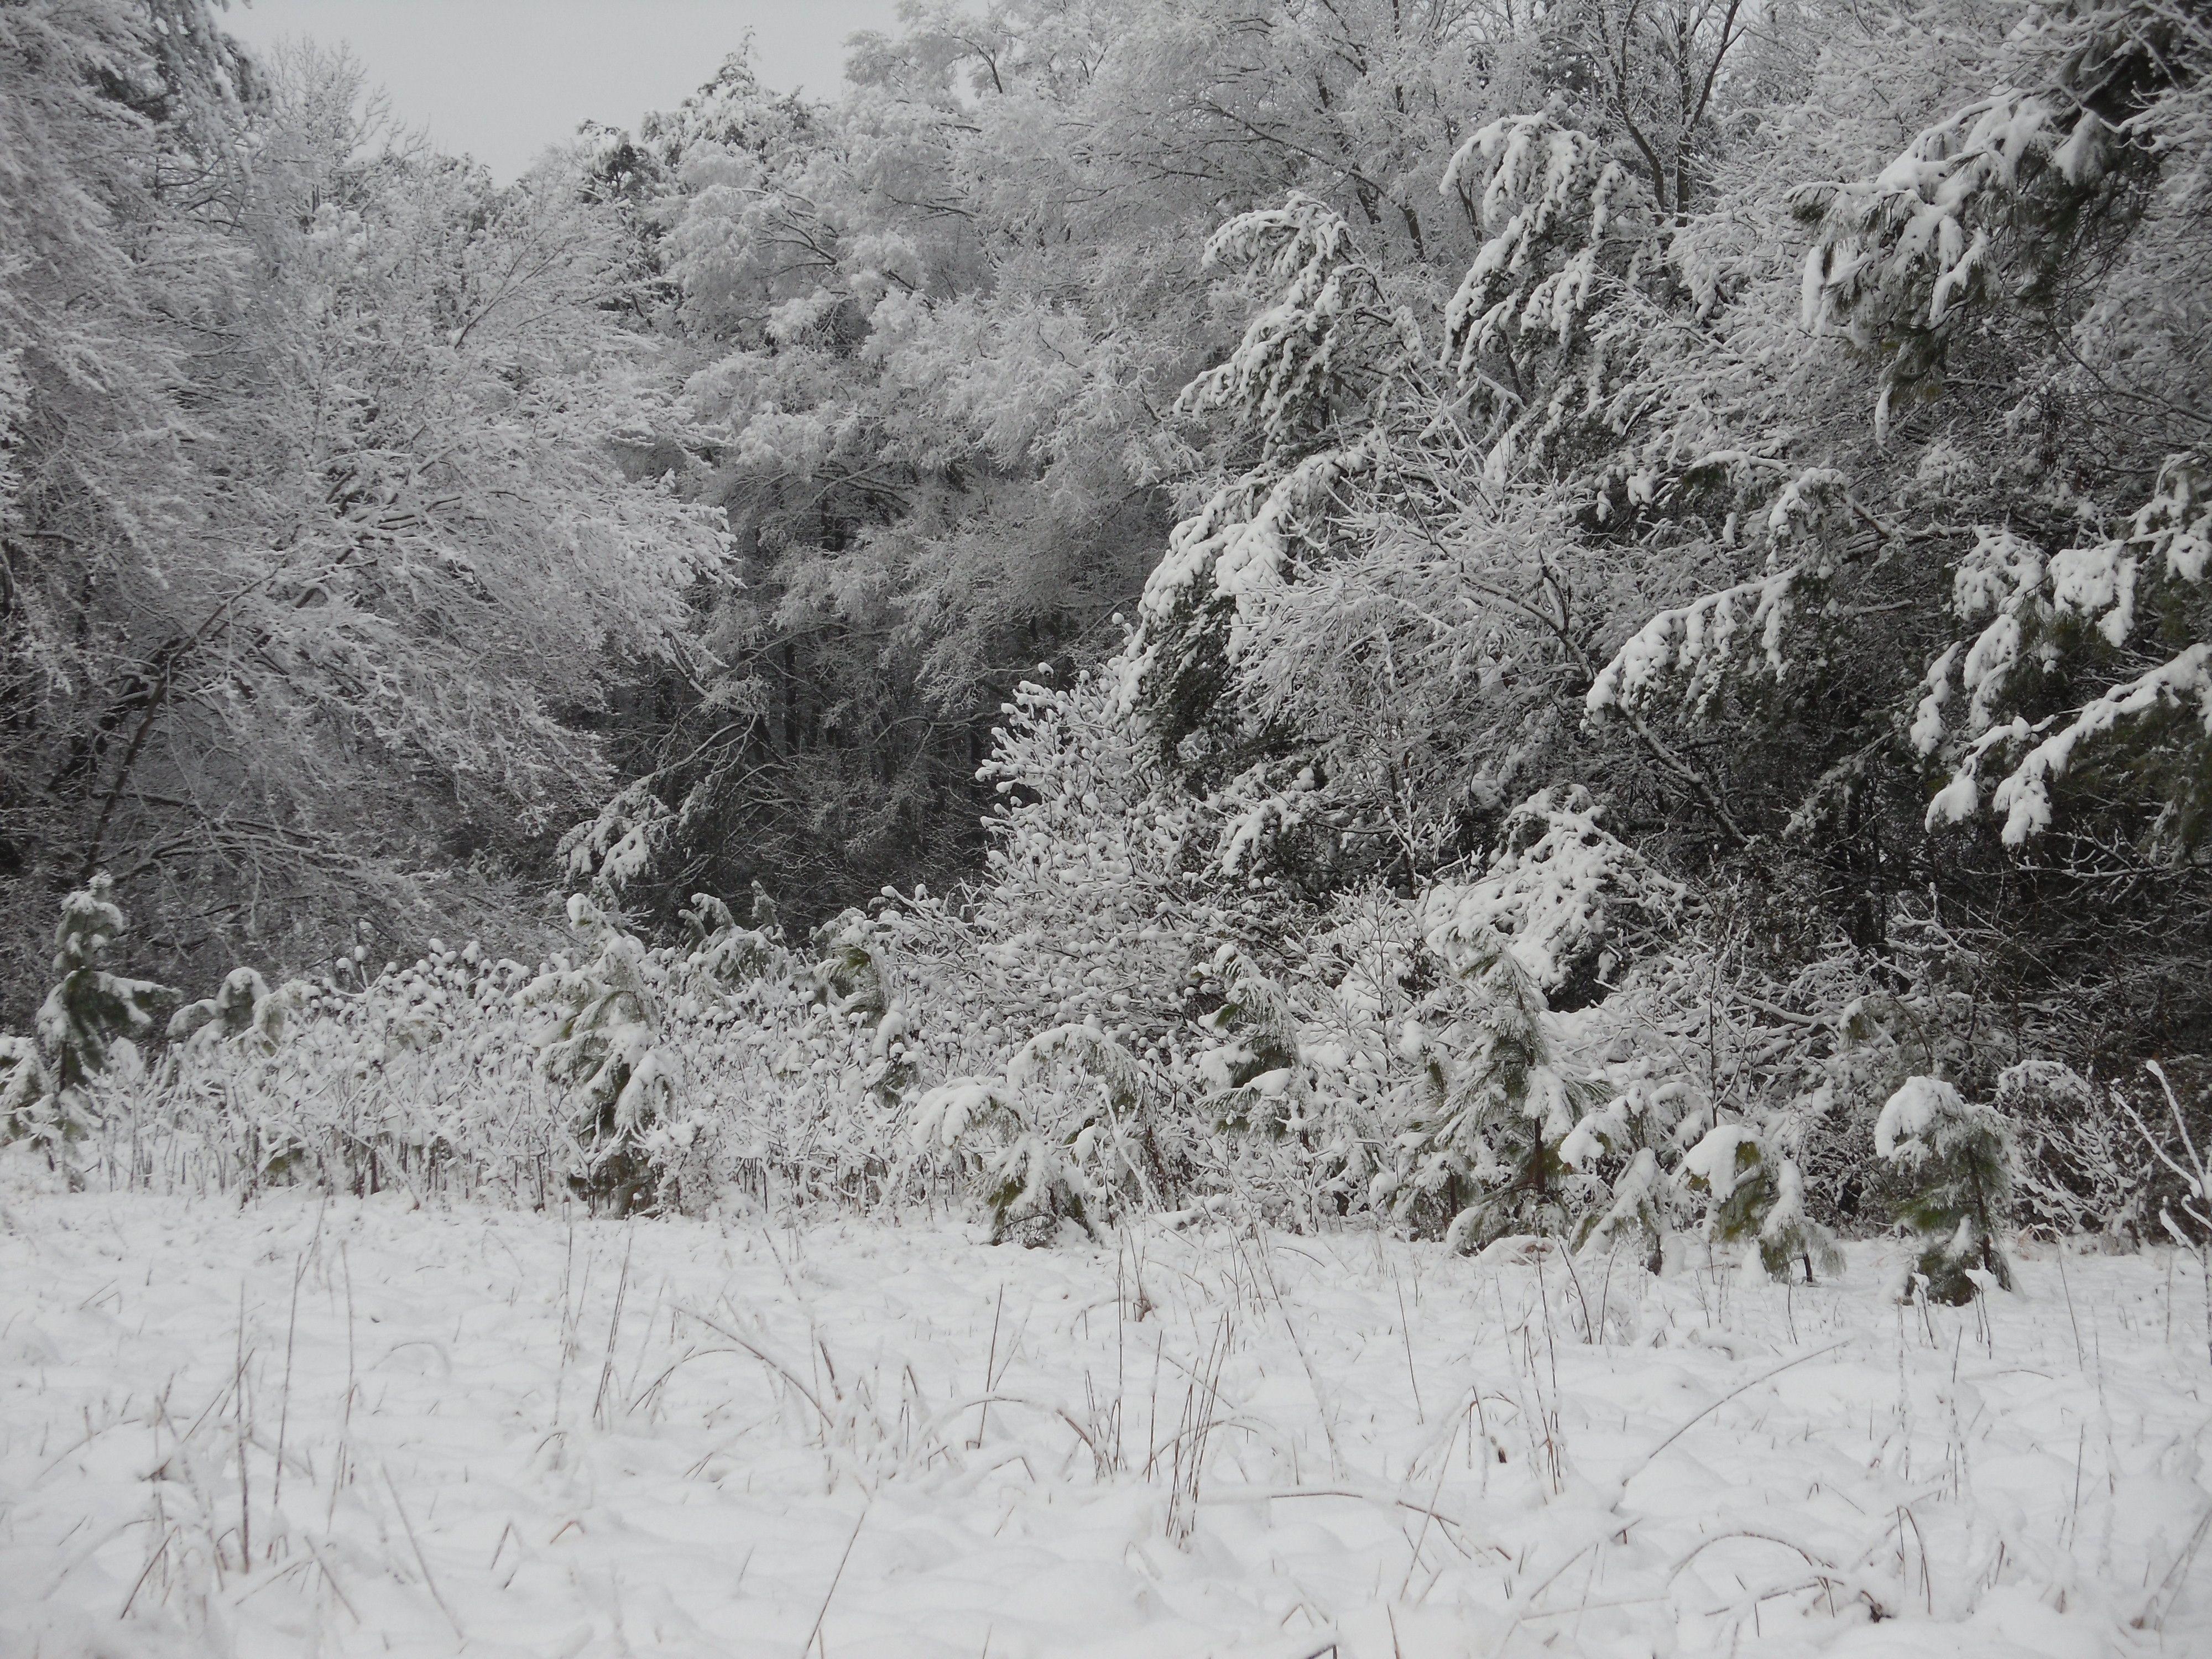 Woodline, Spring Snow, 2013